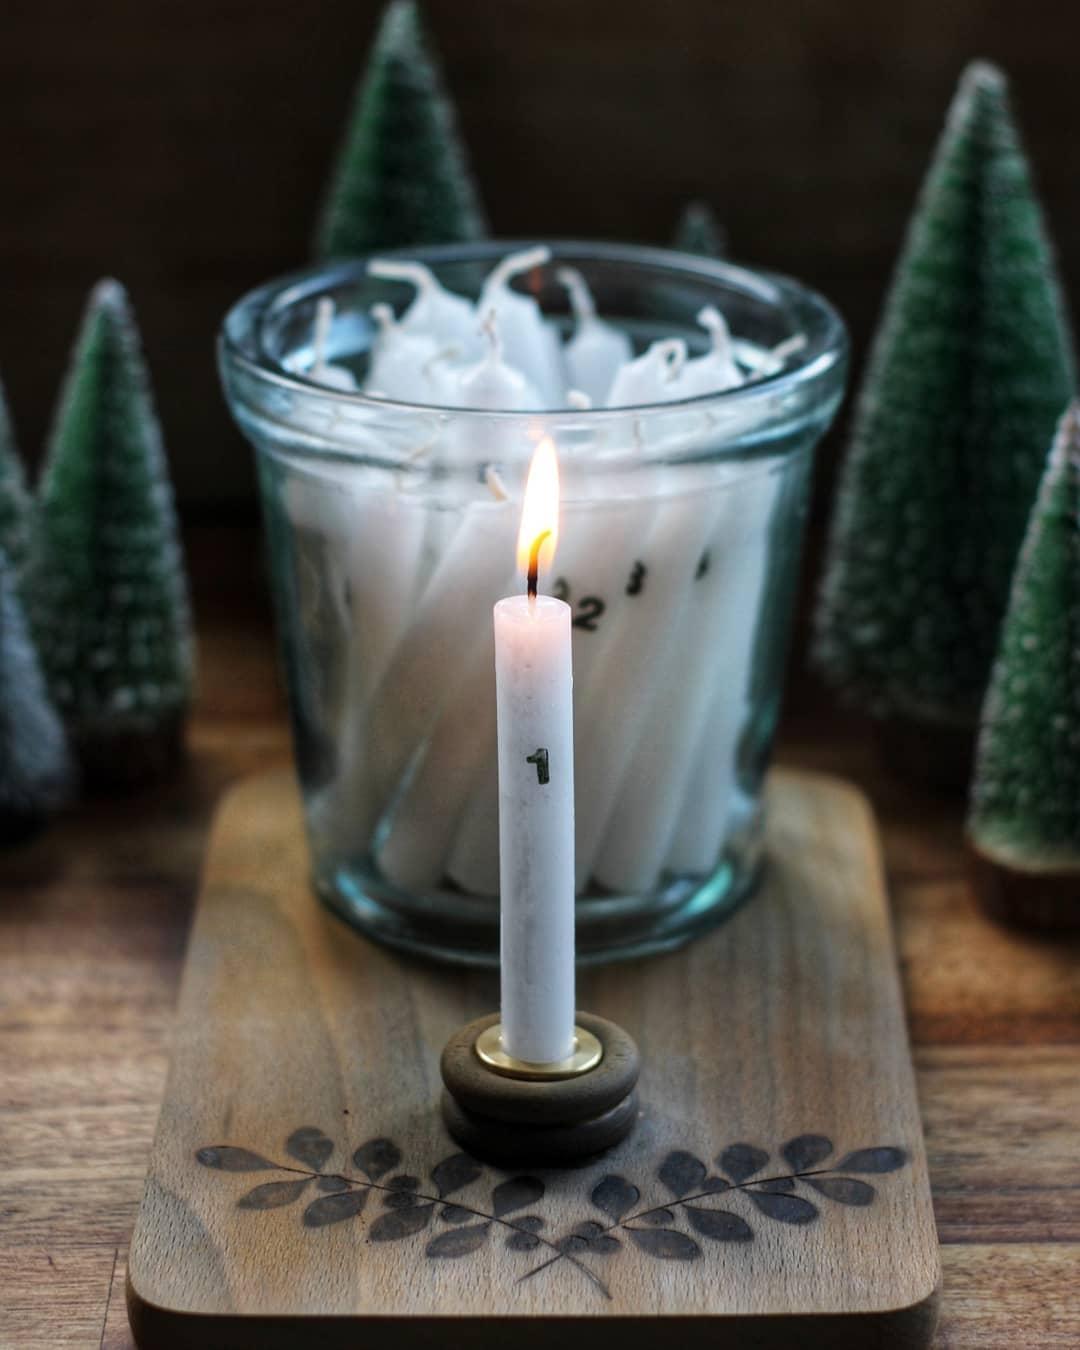 zima a Vianoce - Obrázok č. 15